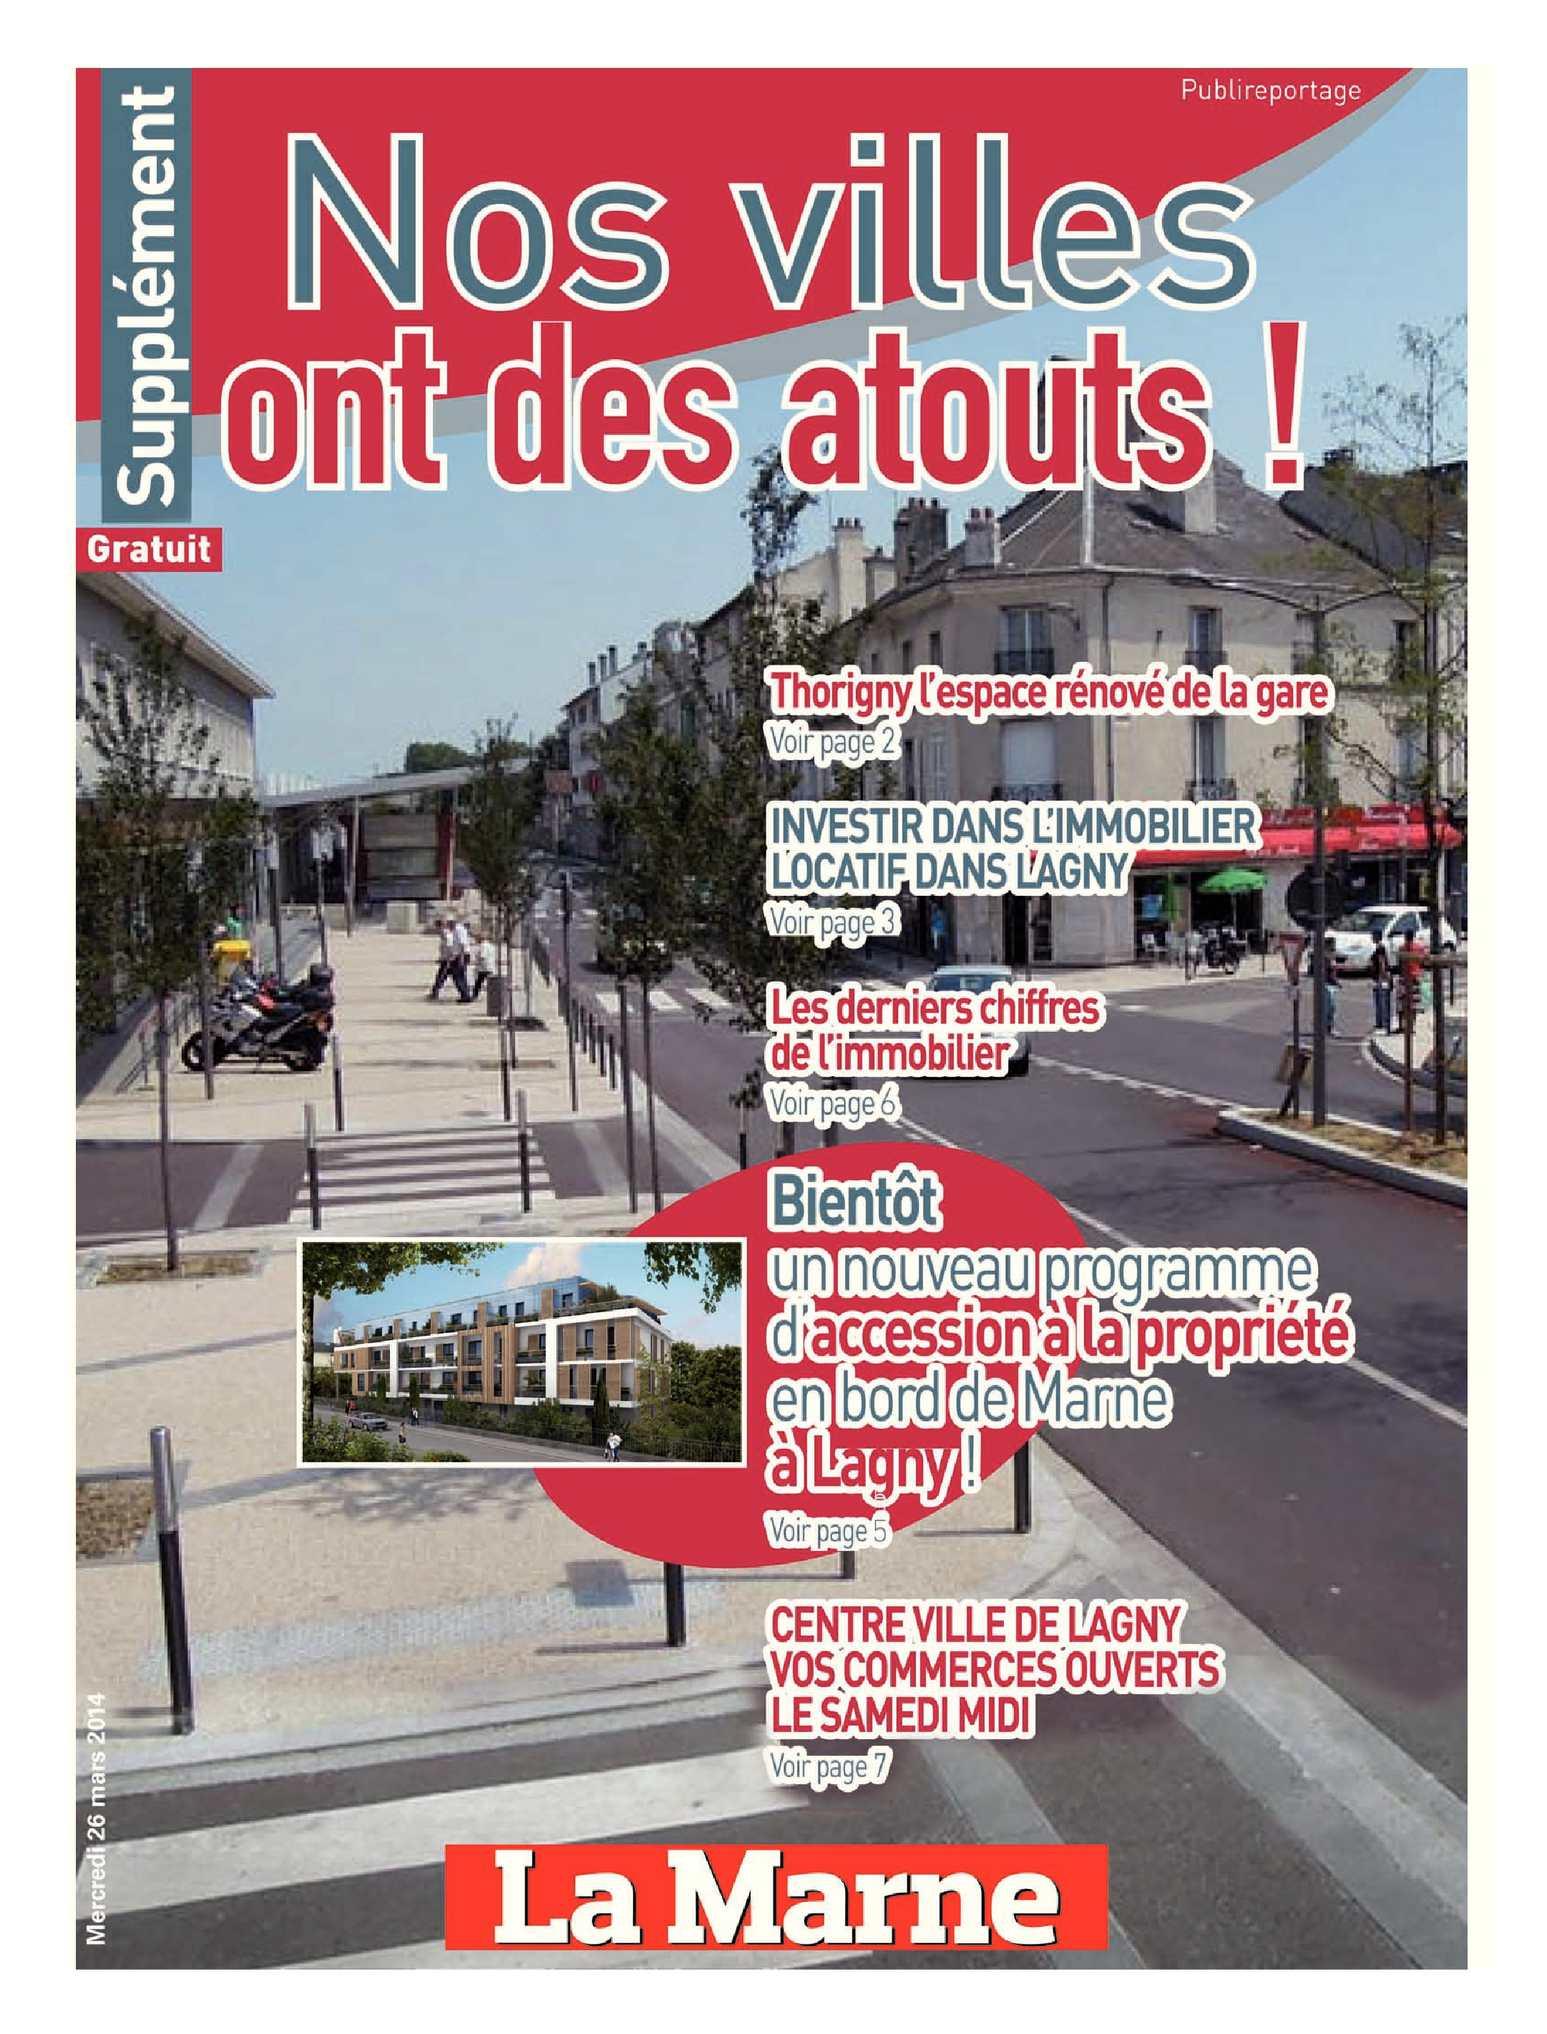 best prices thoughts on uk availability Calaméo - NOS VILLES ONT DES ATOUTS